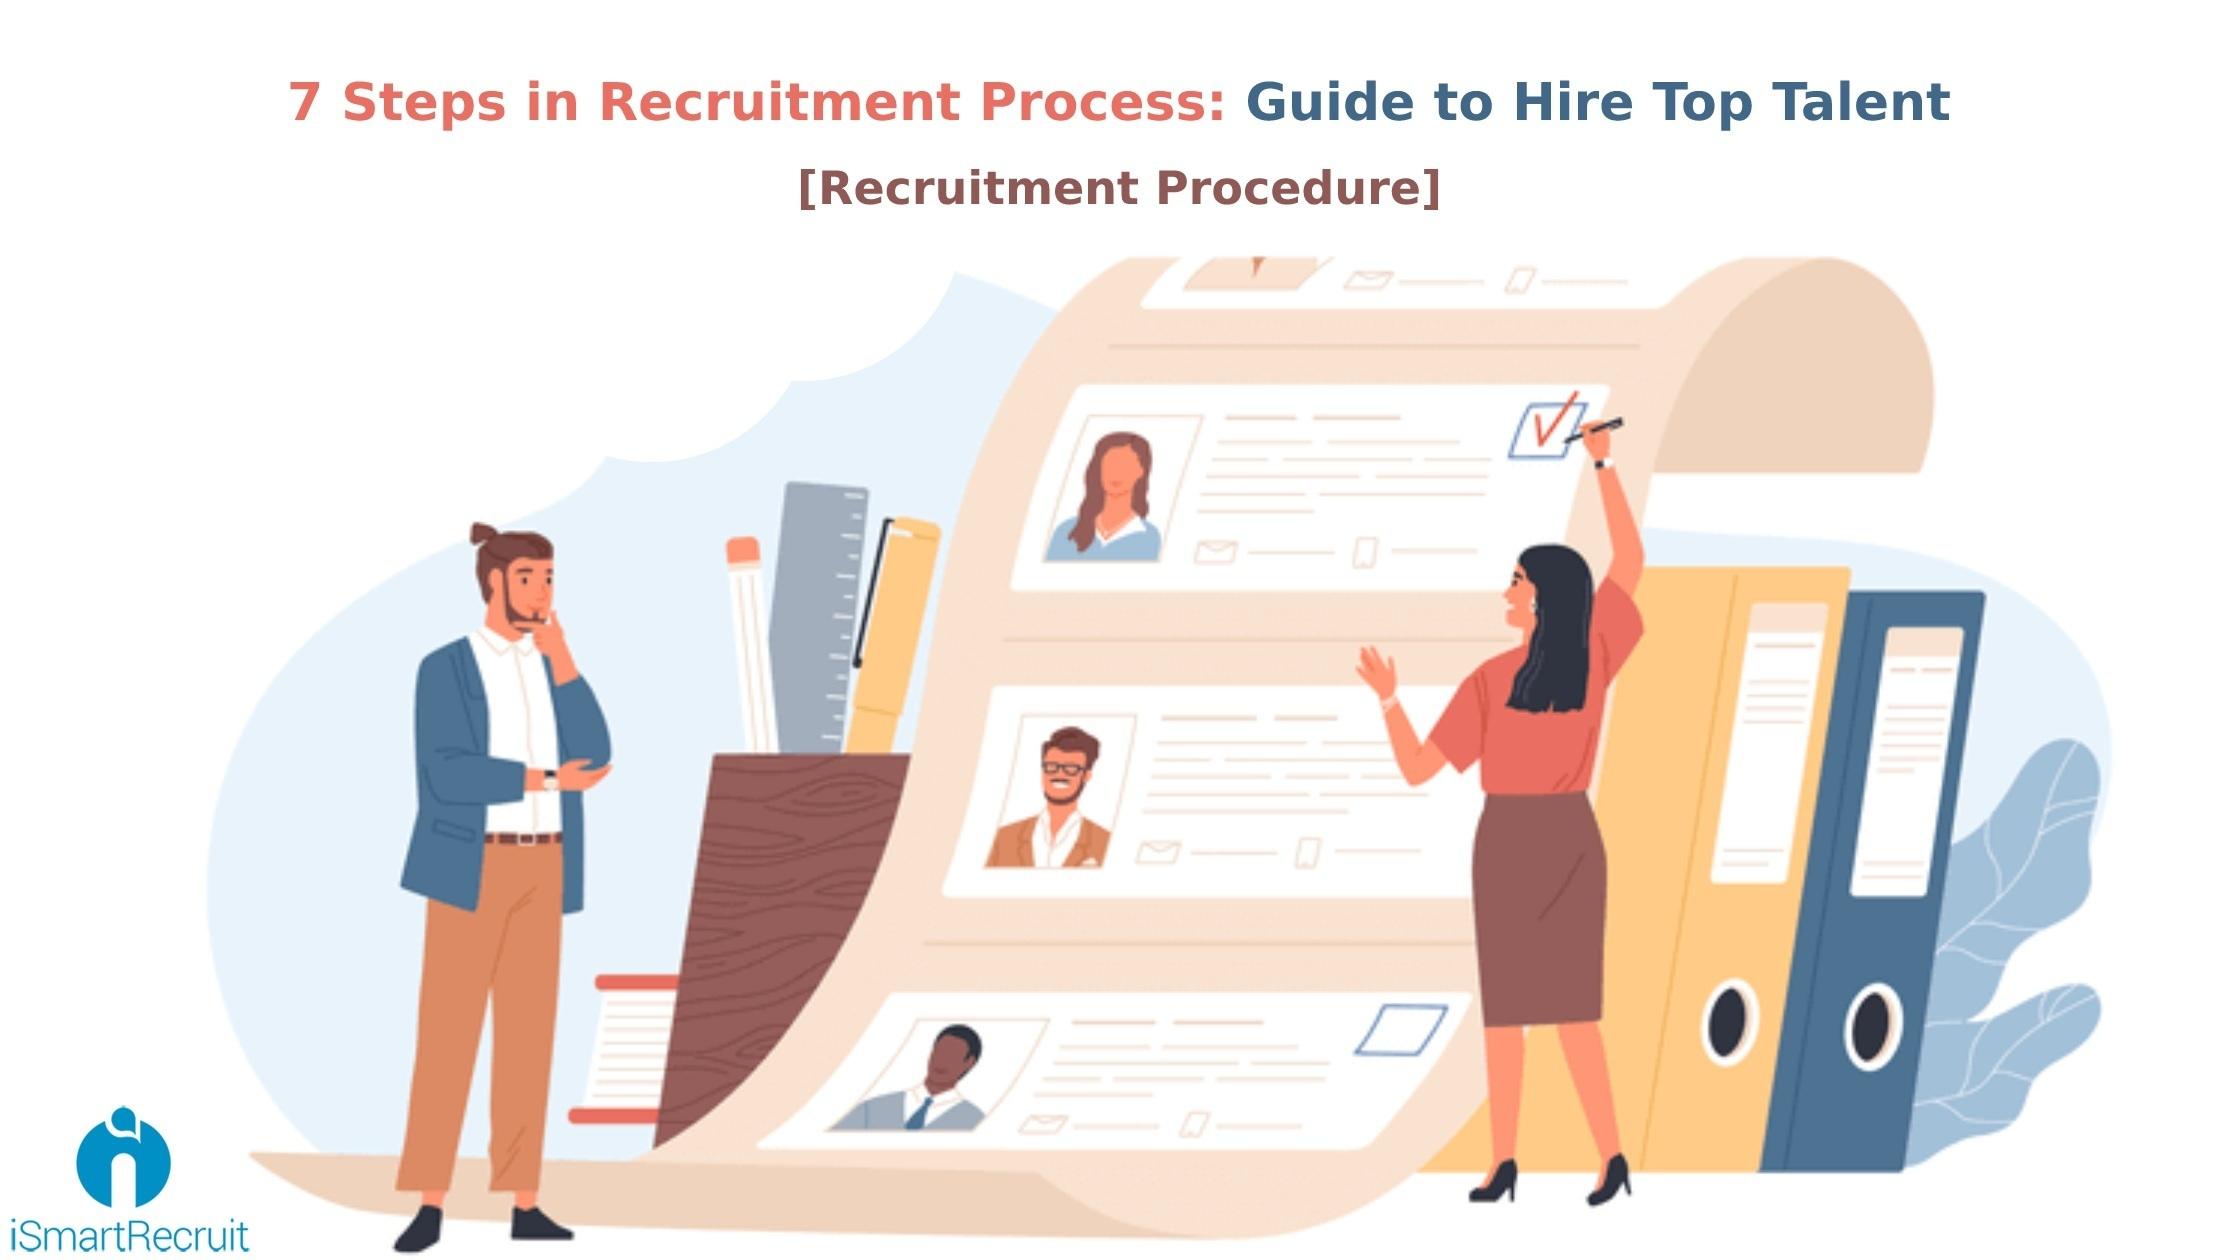 7 Steps in Recruitment Process: Guide to Hire Top Talent [Recruitment Procedure]